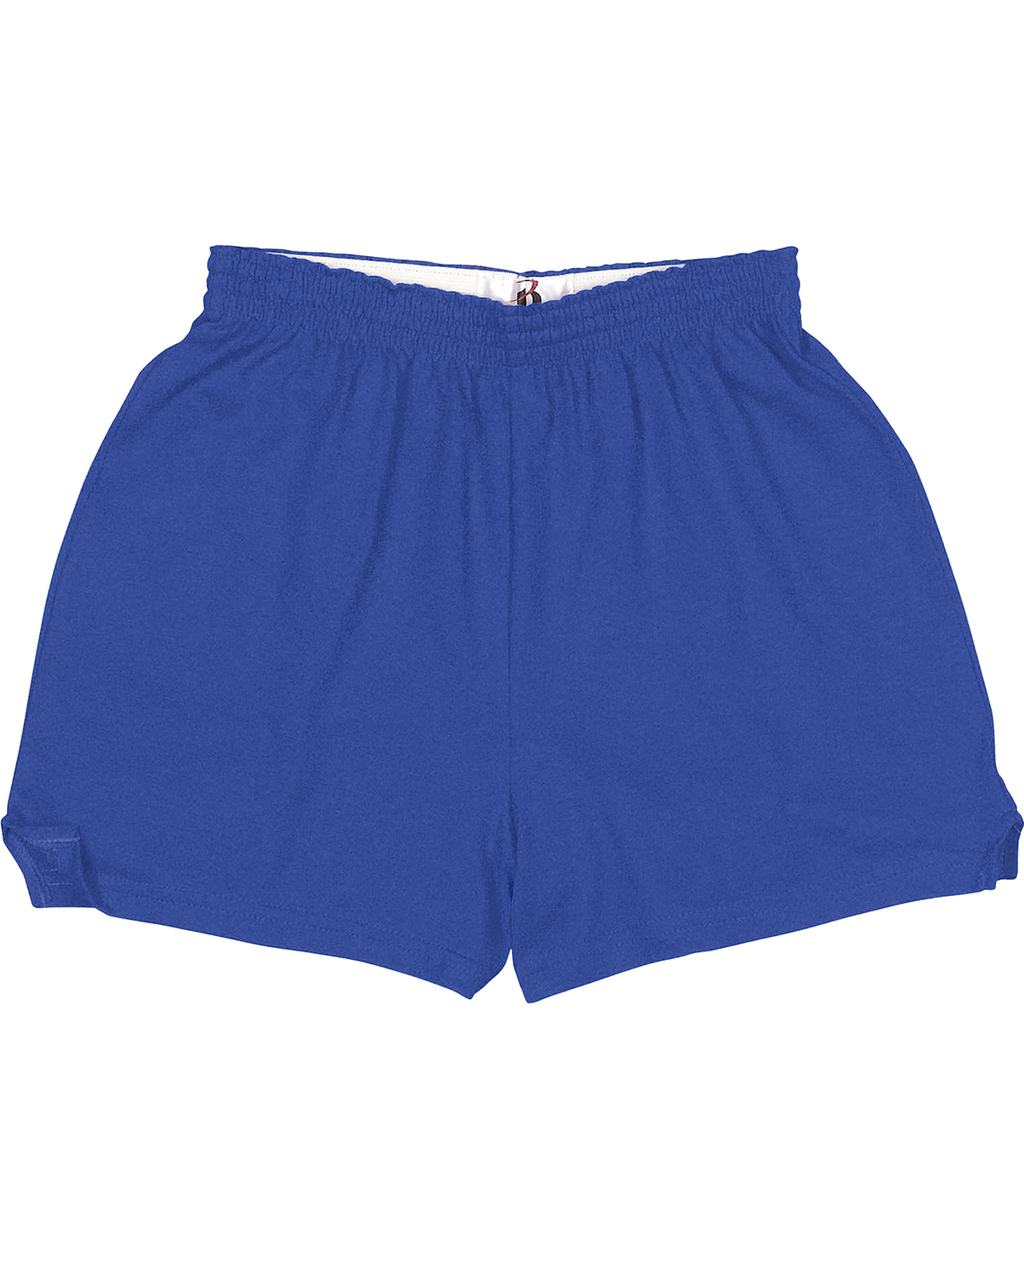 Ladies Cheer Shorts